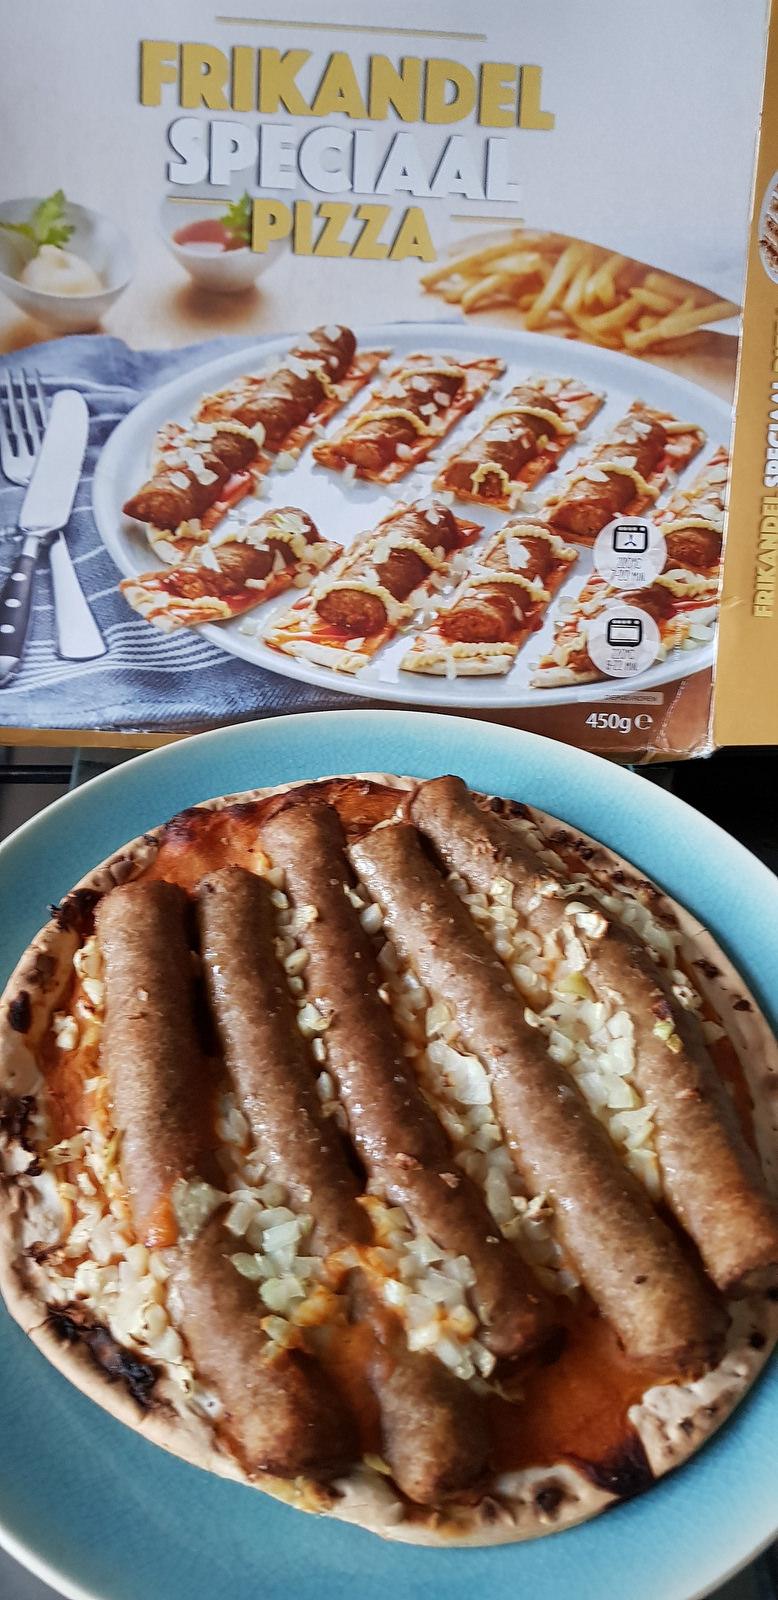 LIDL Frikandel Speciaal pizza